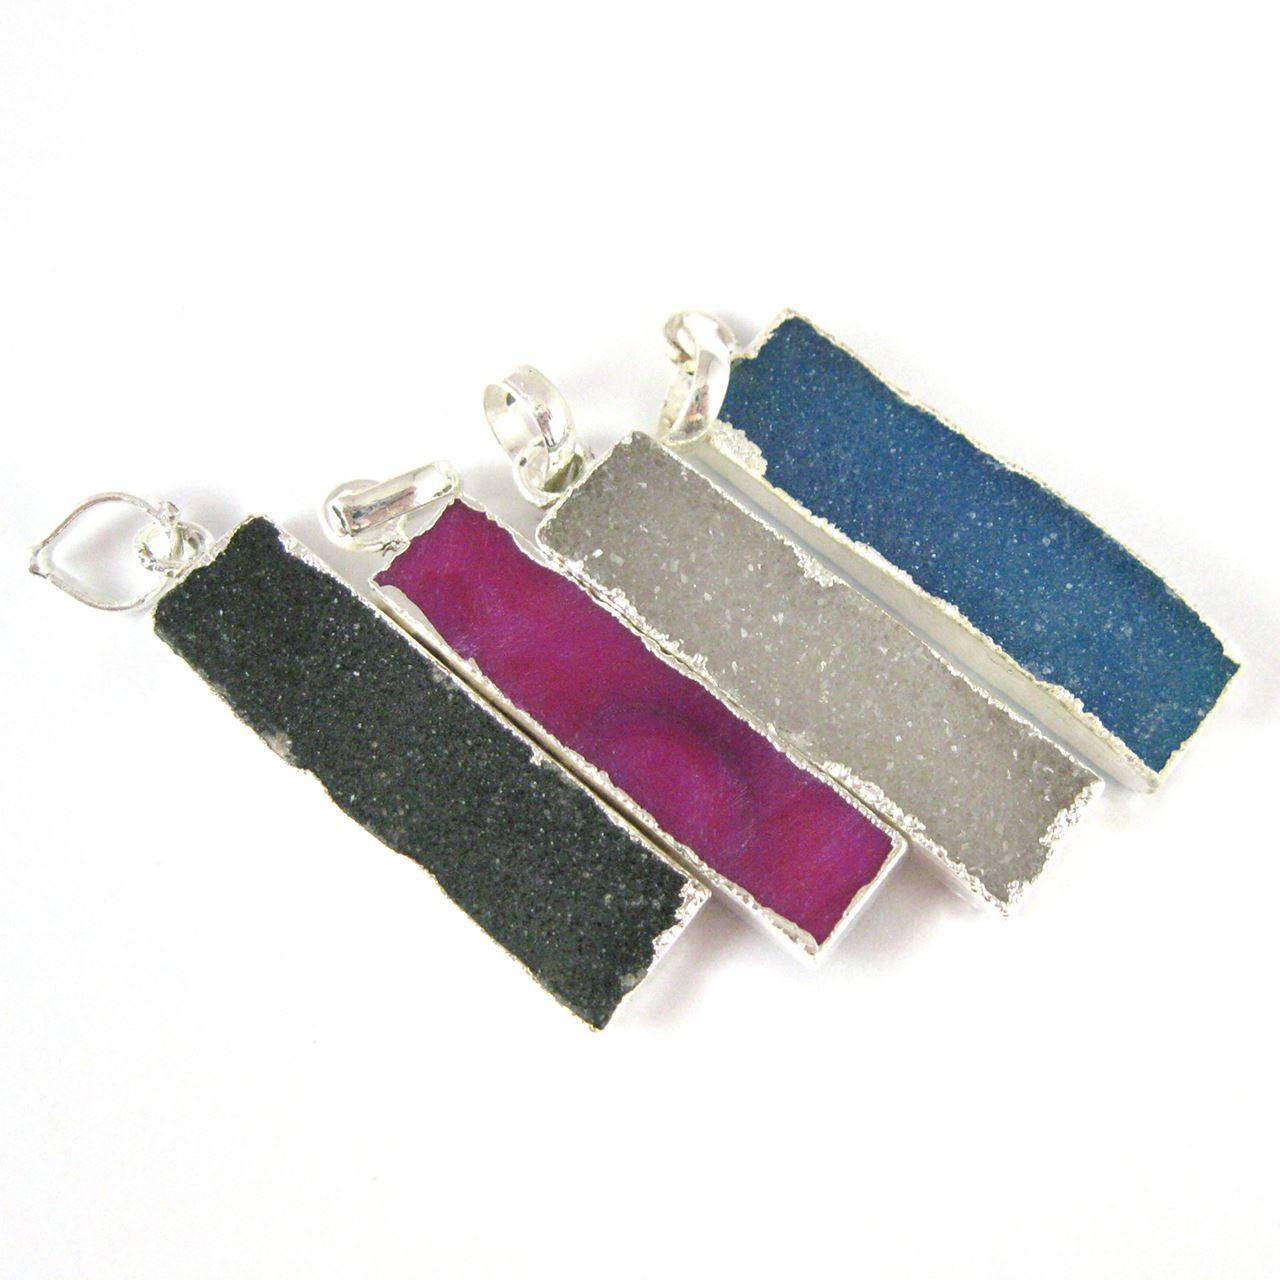 Natural Druzy Agate Bar Pendant, Silver dipped Long Vertical Bar-Pink